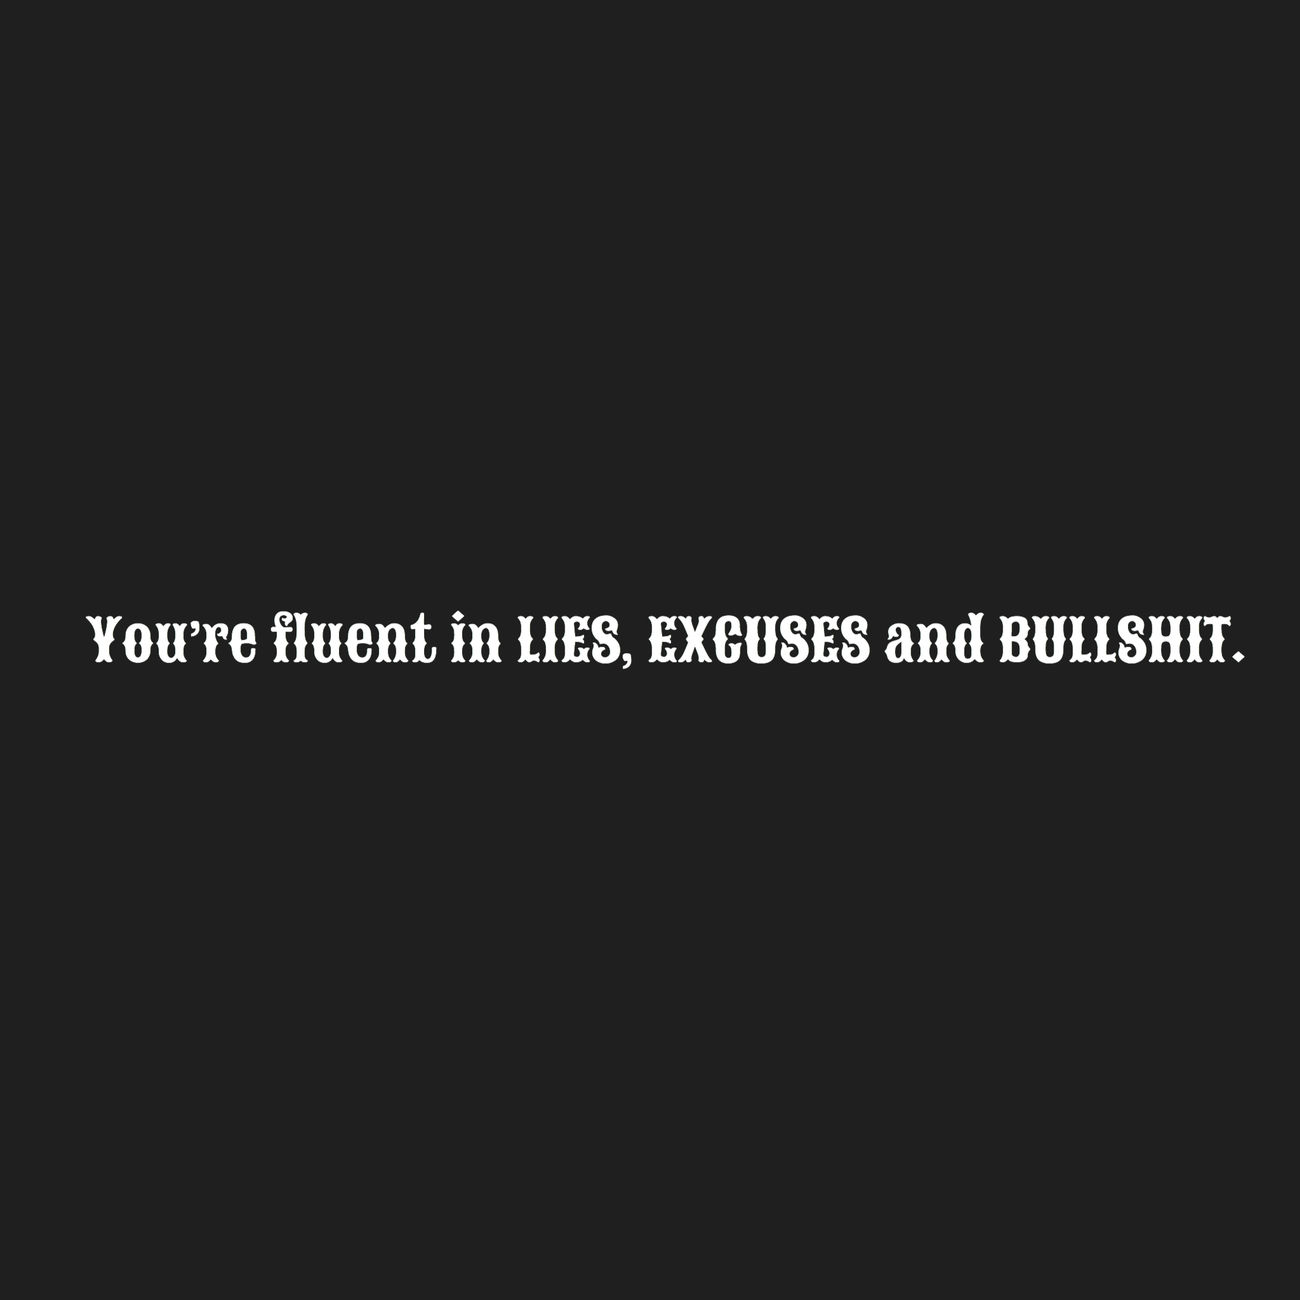 Lies. Excuses. Bullshit. Doncorpus @doncorpus